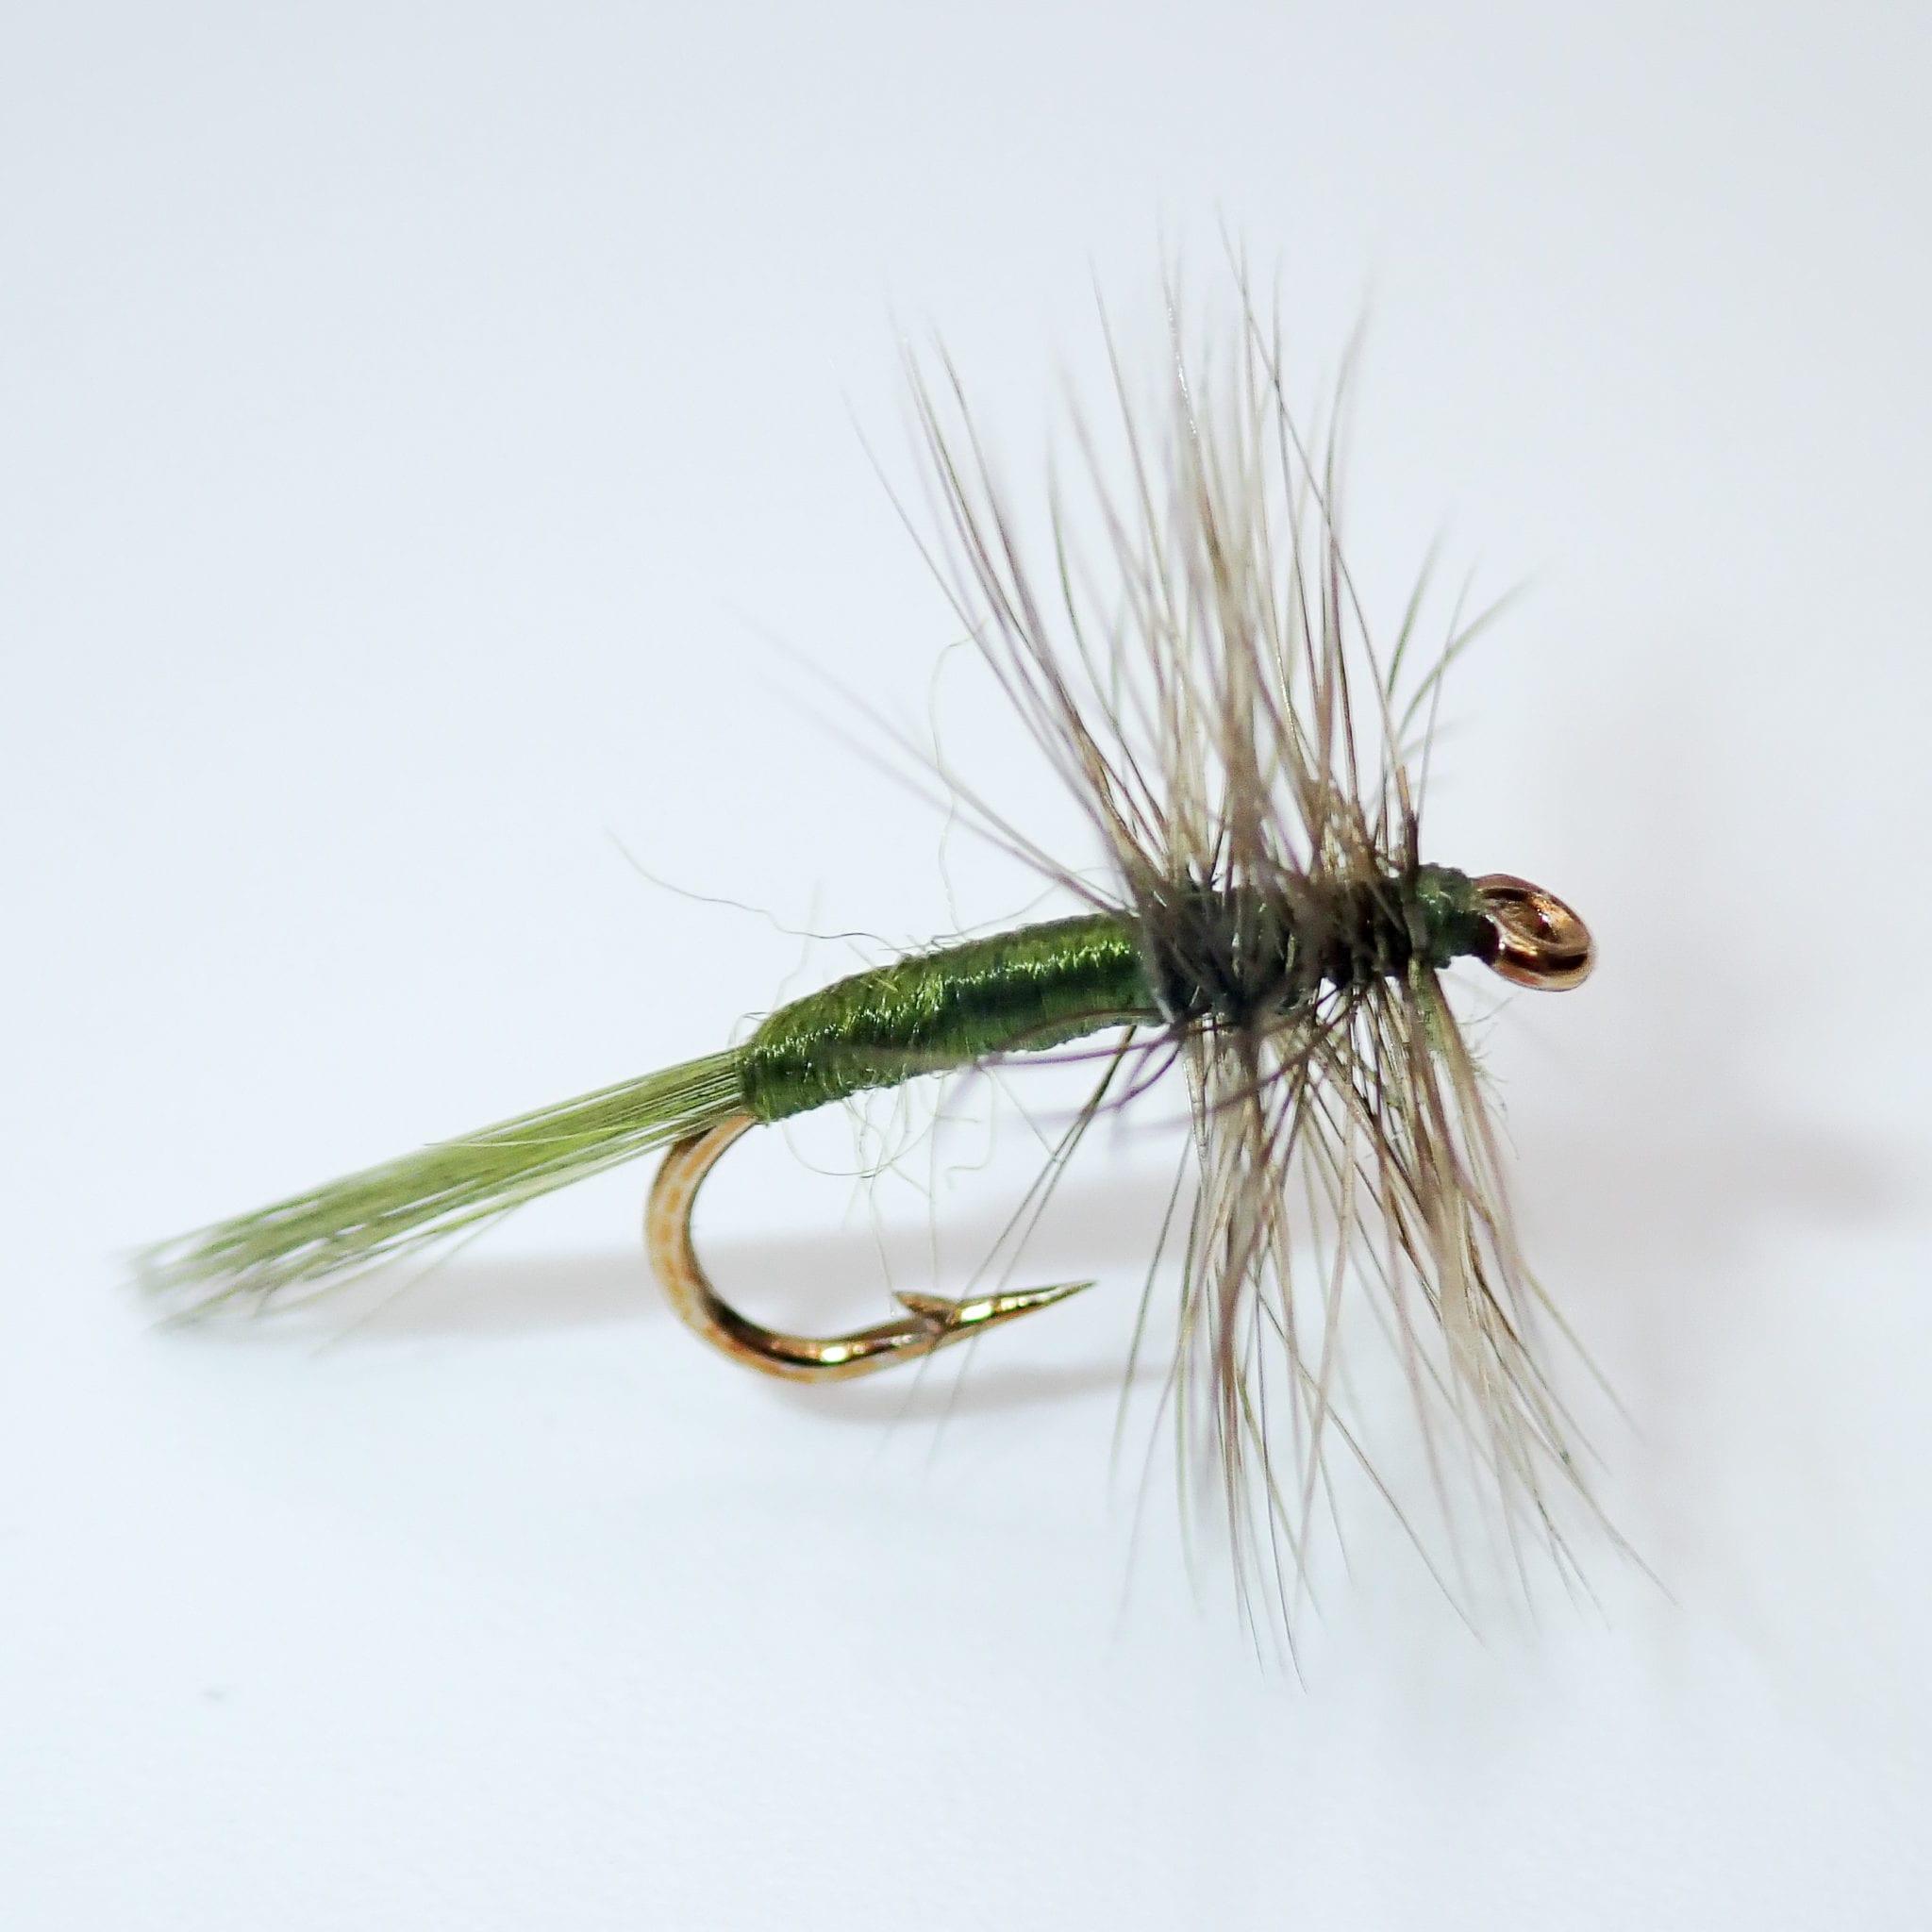 Set of 3 Olive Midge Flies Fly Fishing Size 16